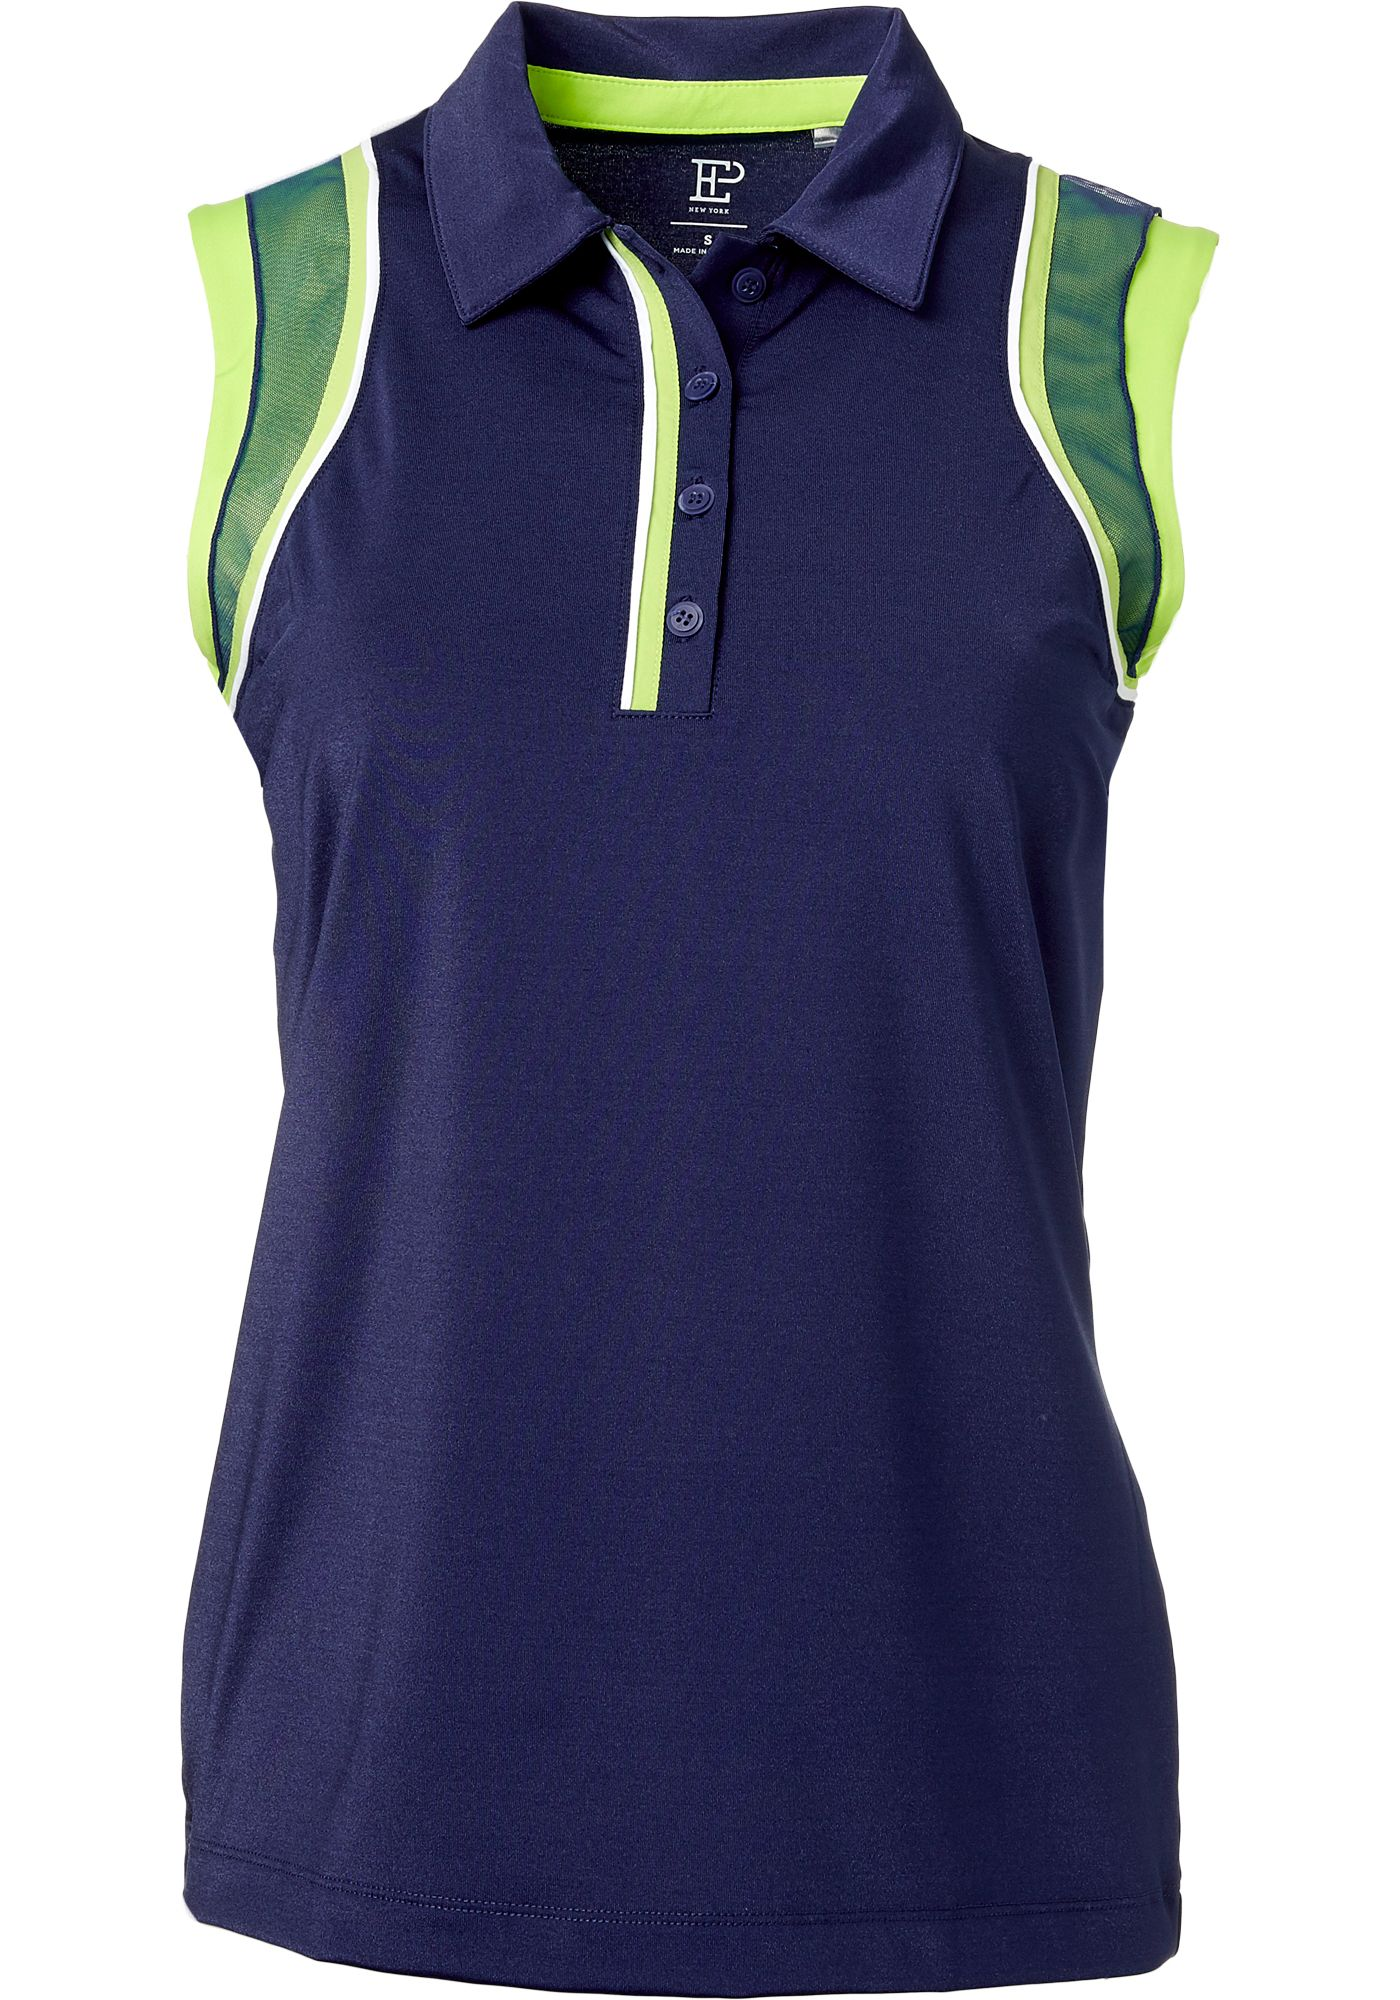 EP Pro Women's Sleeveless Shimmer Jersey Golf Polo